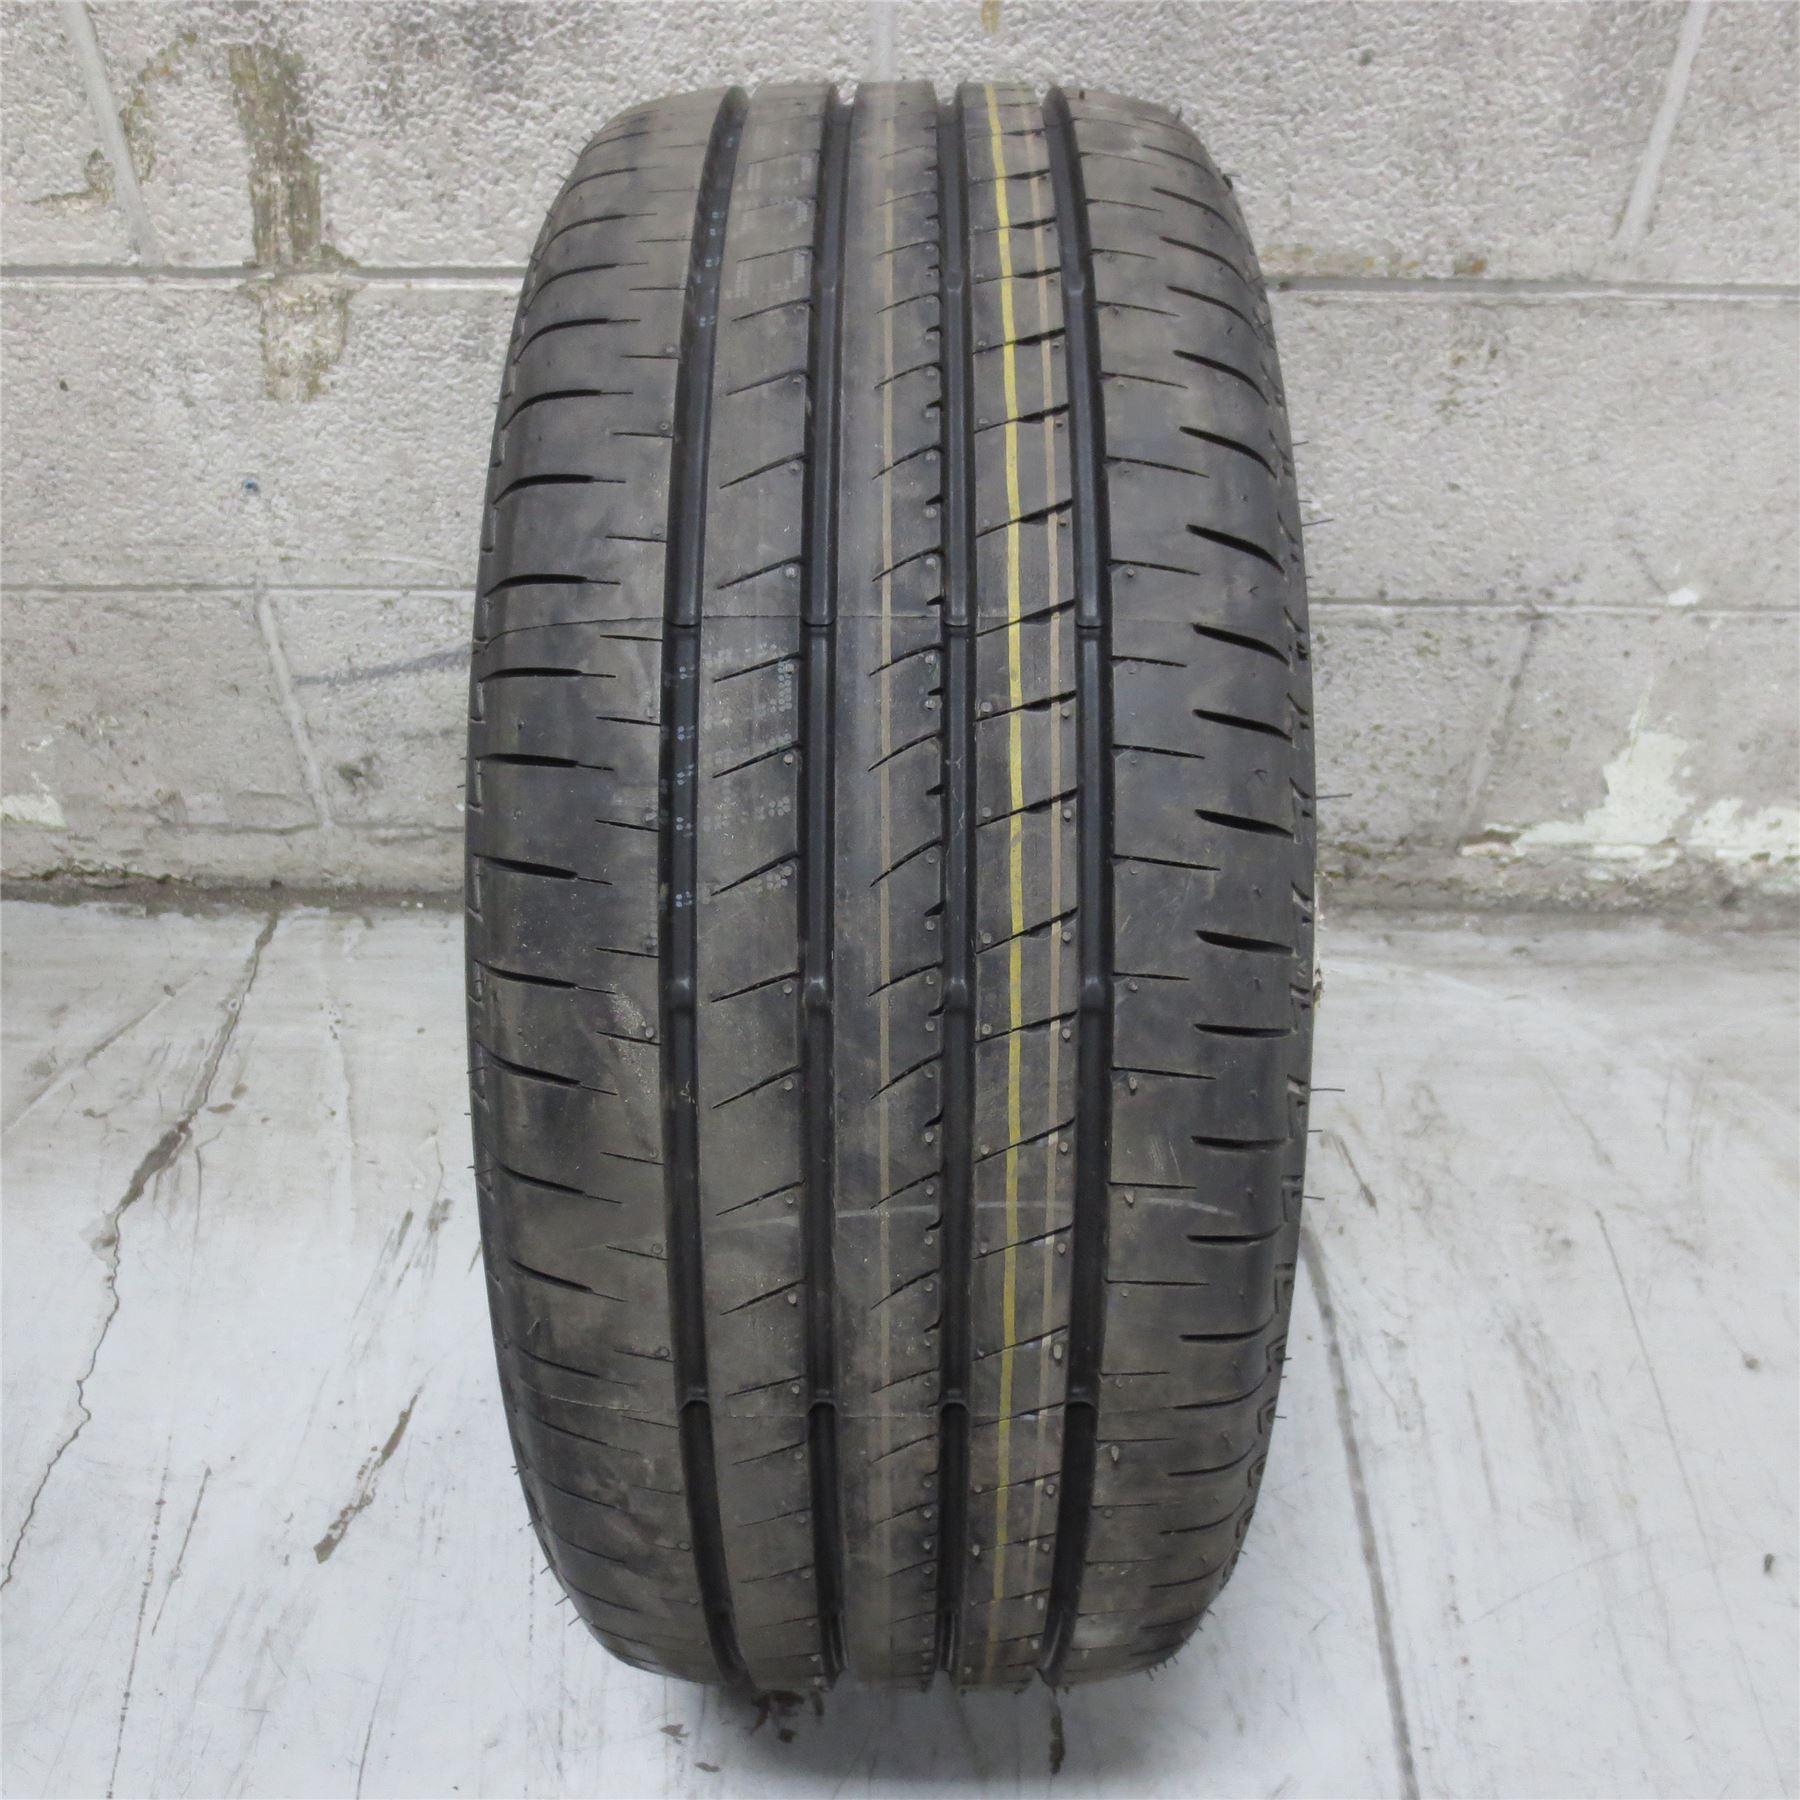 235//40R19 Bridgestone TURANZA EL440 92V Tire NO REPAIRS 10//32nd